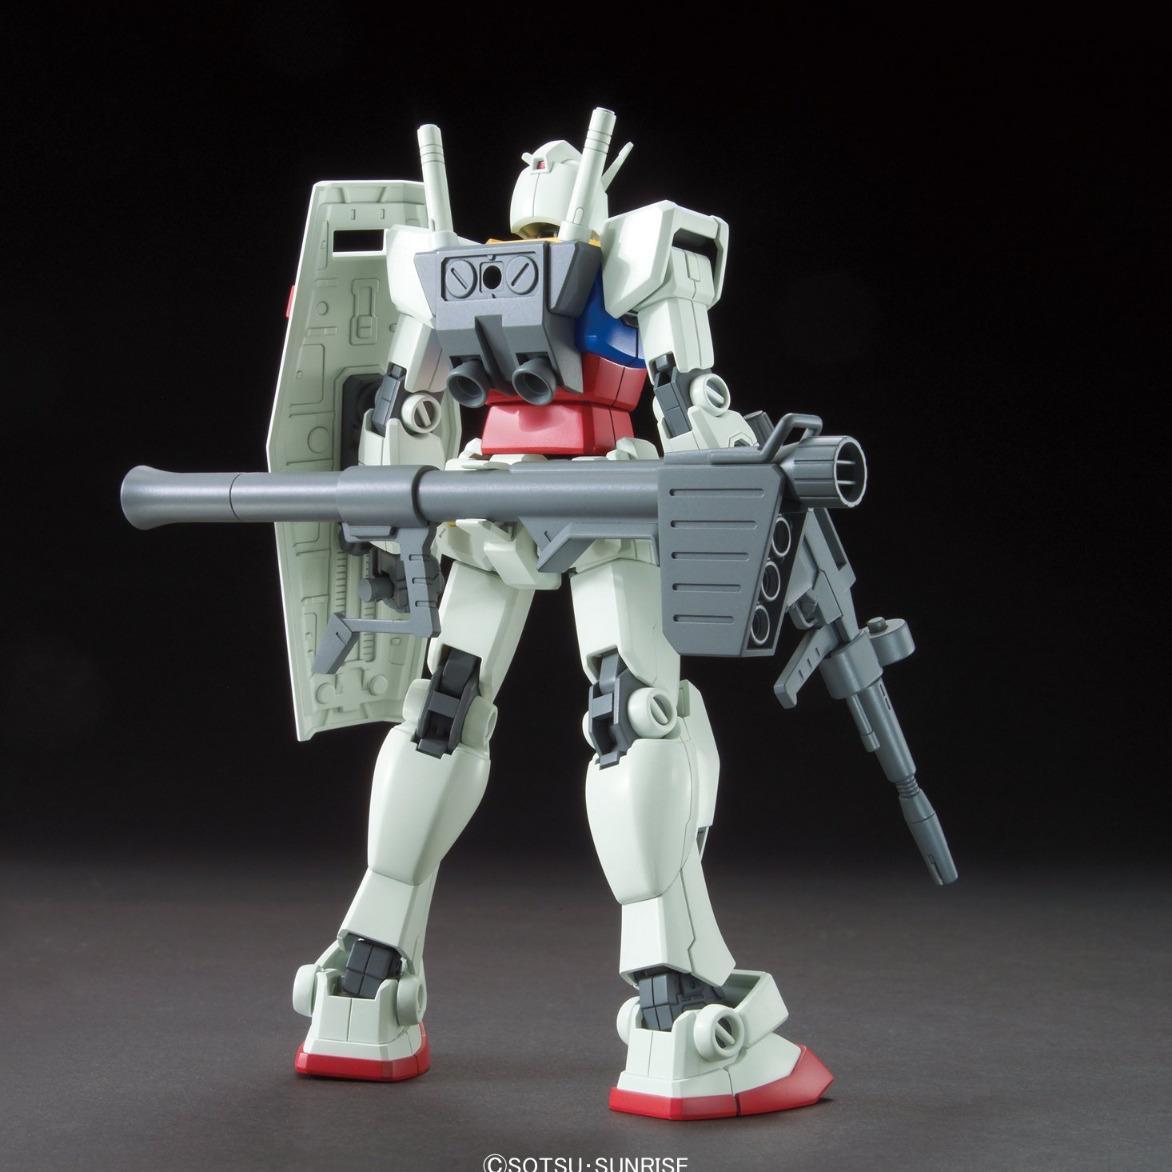 HGUC RX-78-2 Gundam Revive